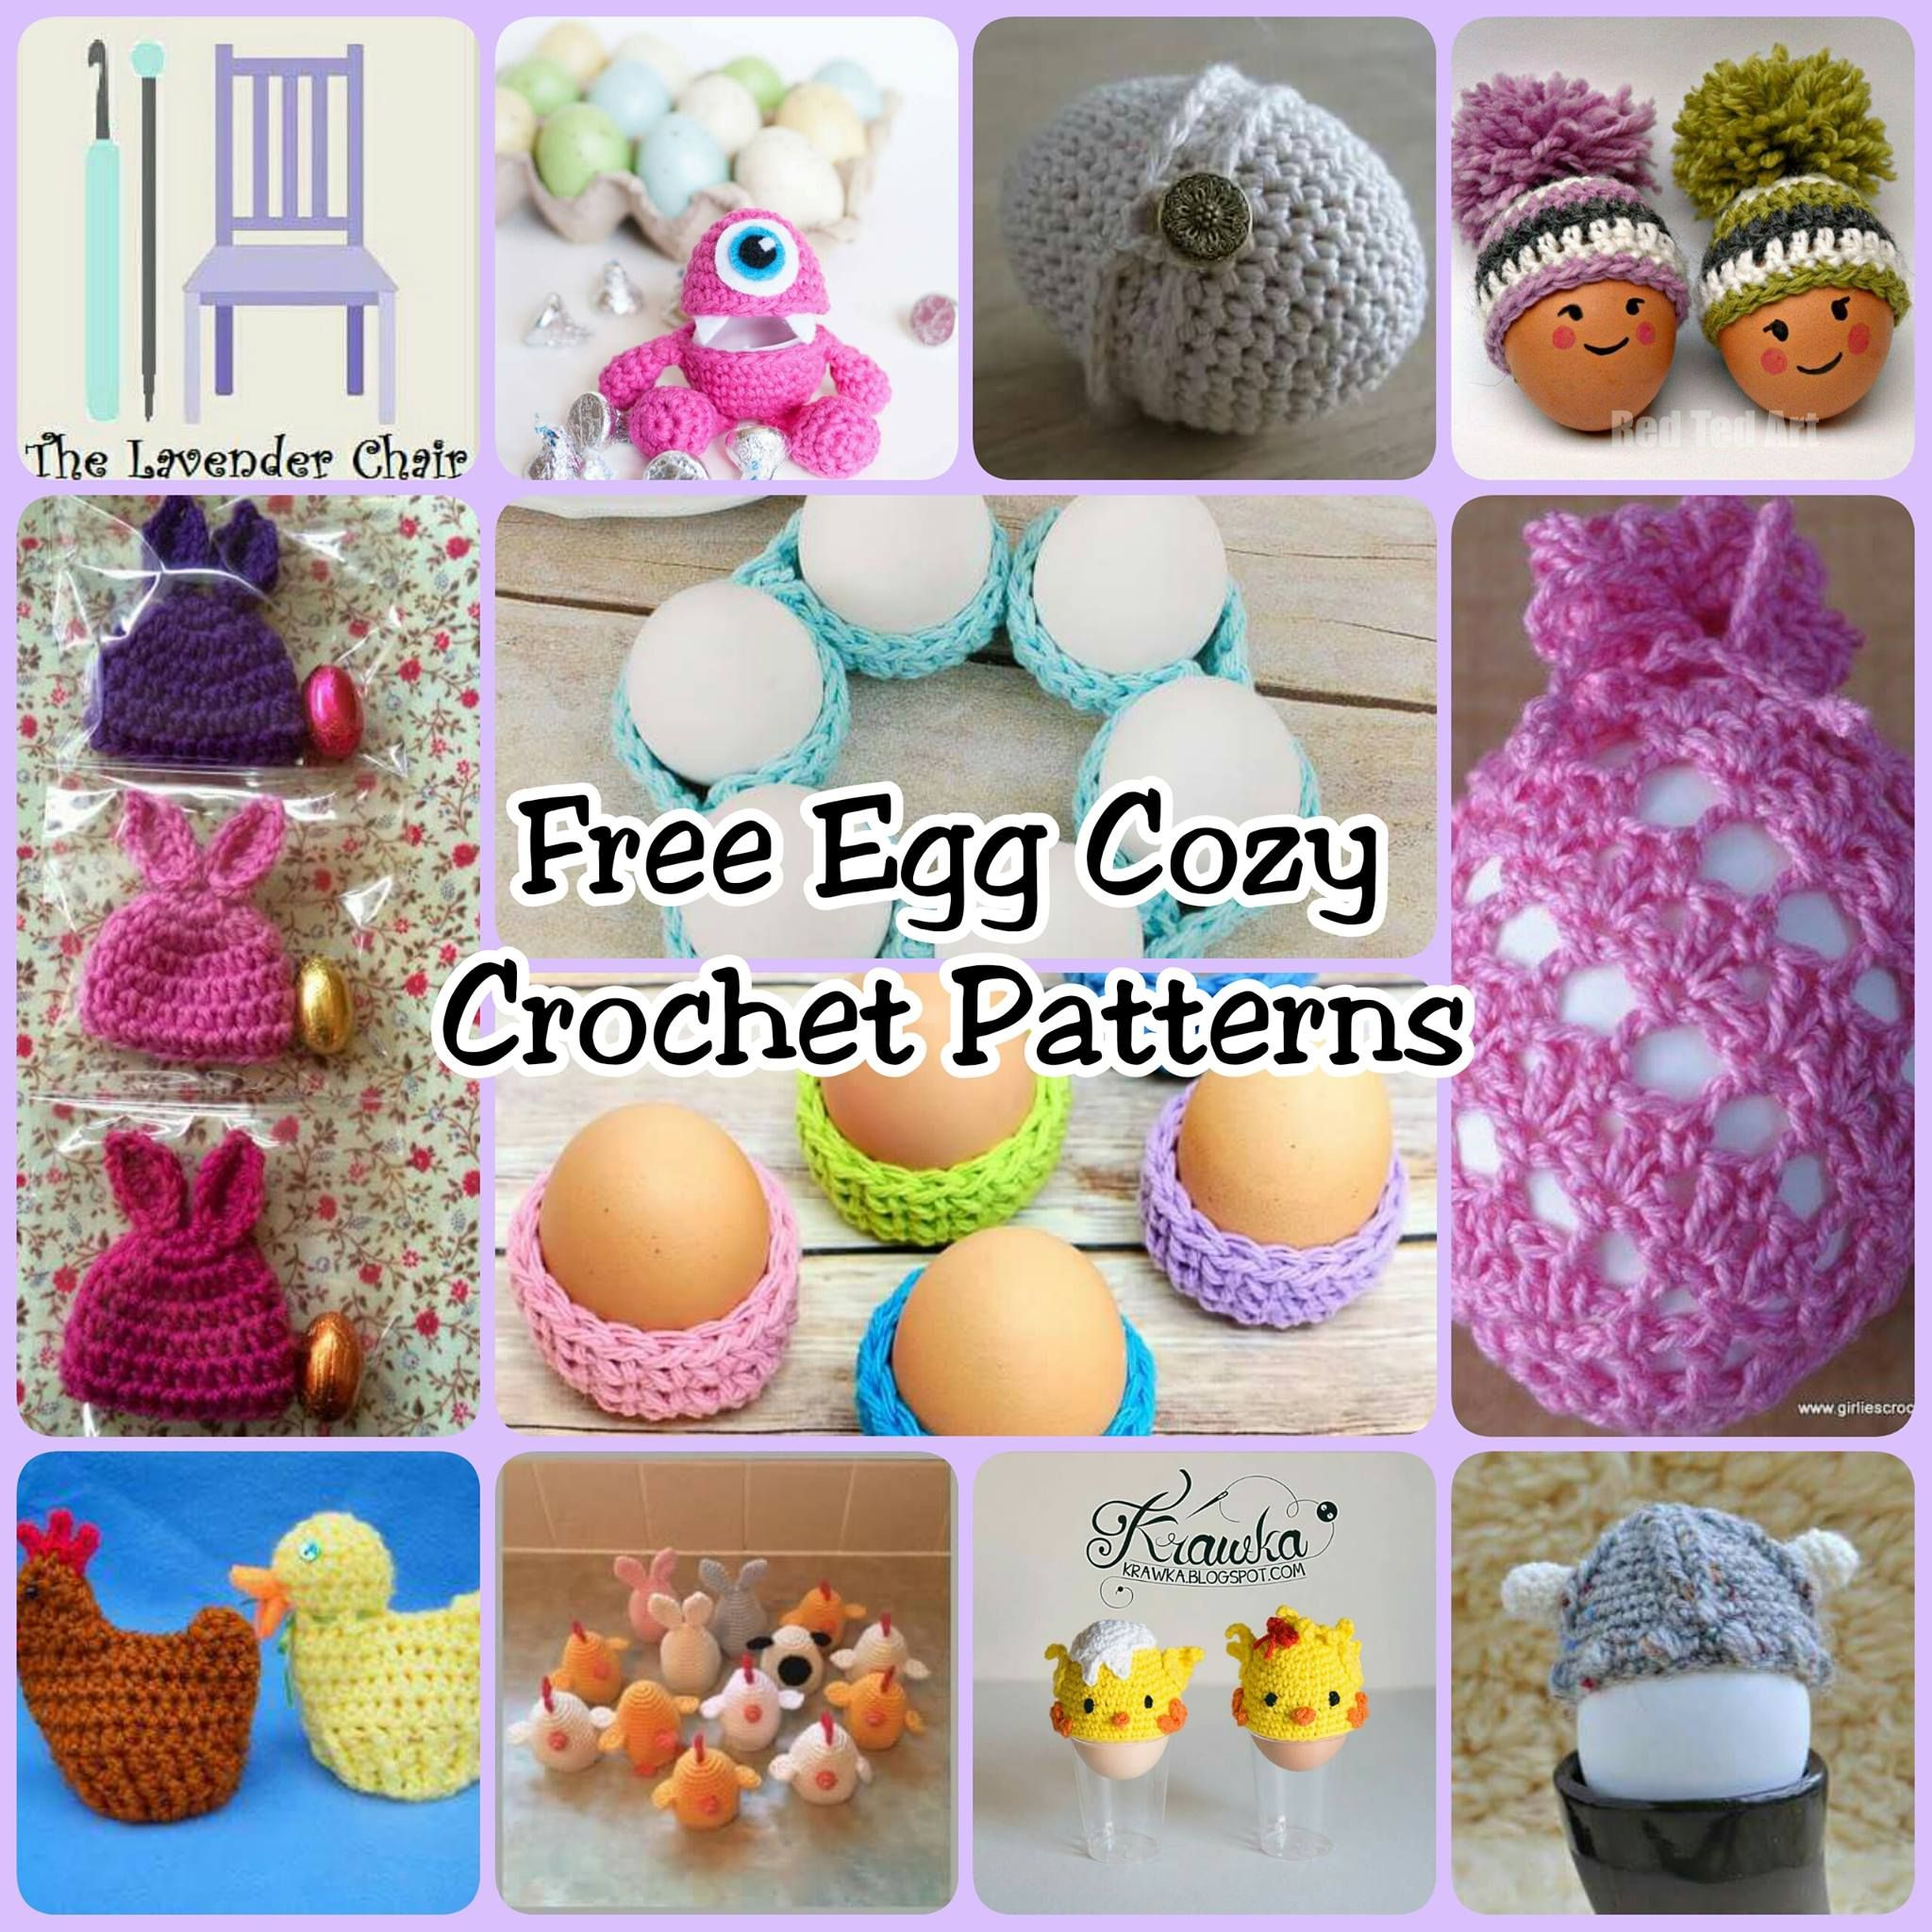 FREE Egg Cozy Crochet Patterns | Pinterest